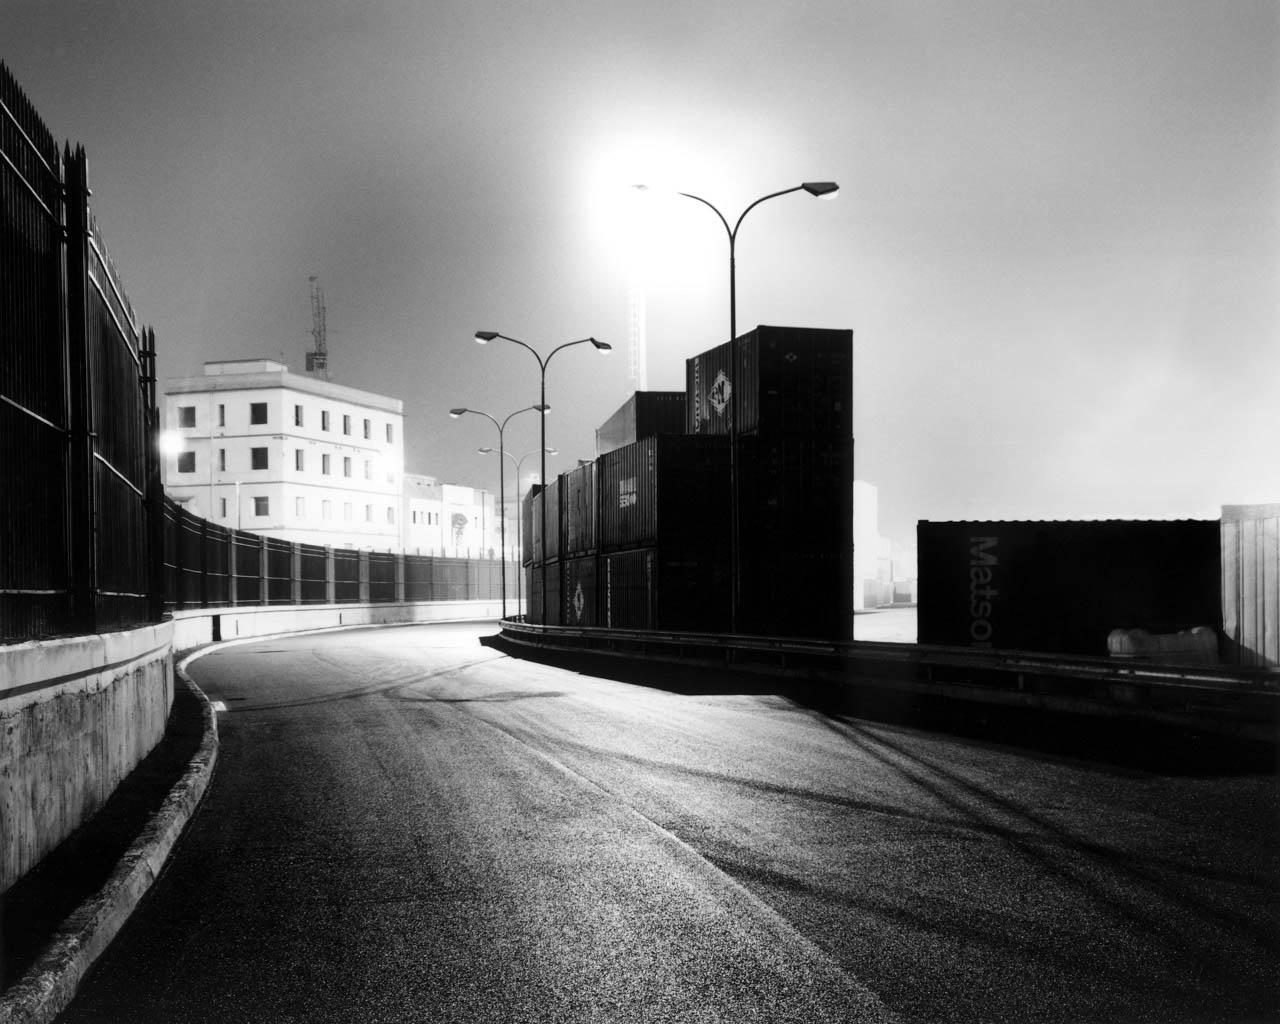 Strada interna, porto di Napoli, 2001 Stampa digitale su carta Hahnemuhle, cm 100x120 / cm 120x140 (ed. 6 + 1AP)